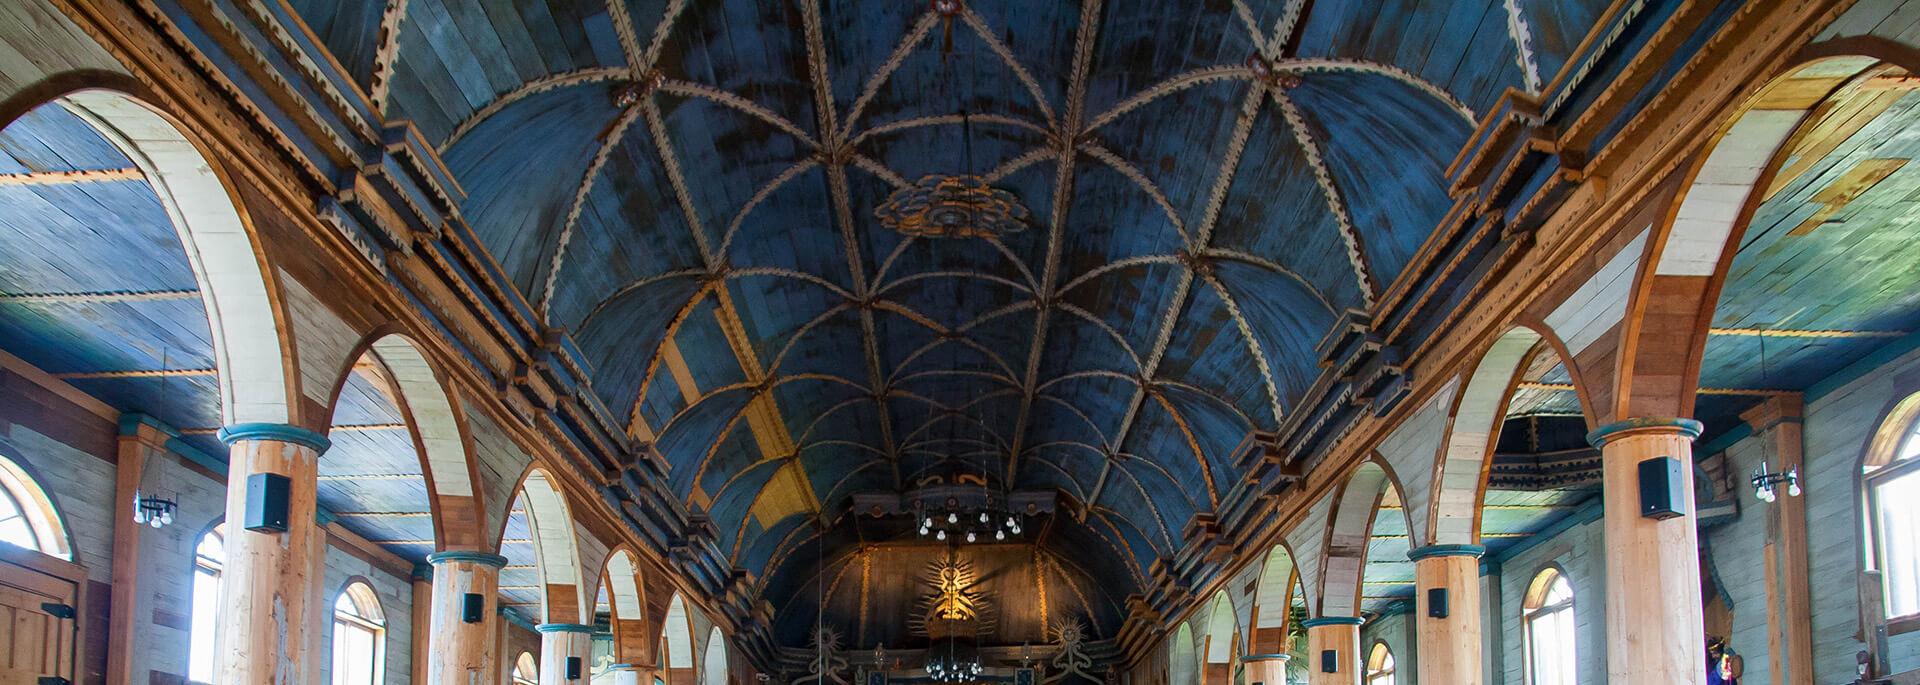 Hölzernes Weltkulturerbe: Chiloés Kirchen